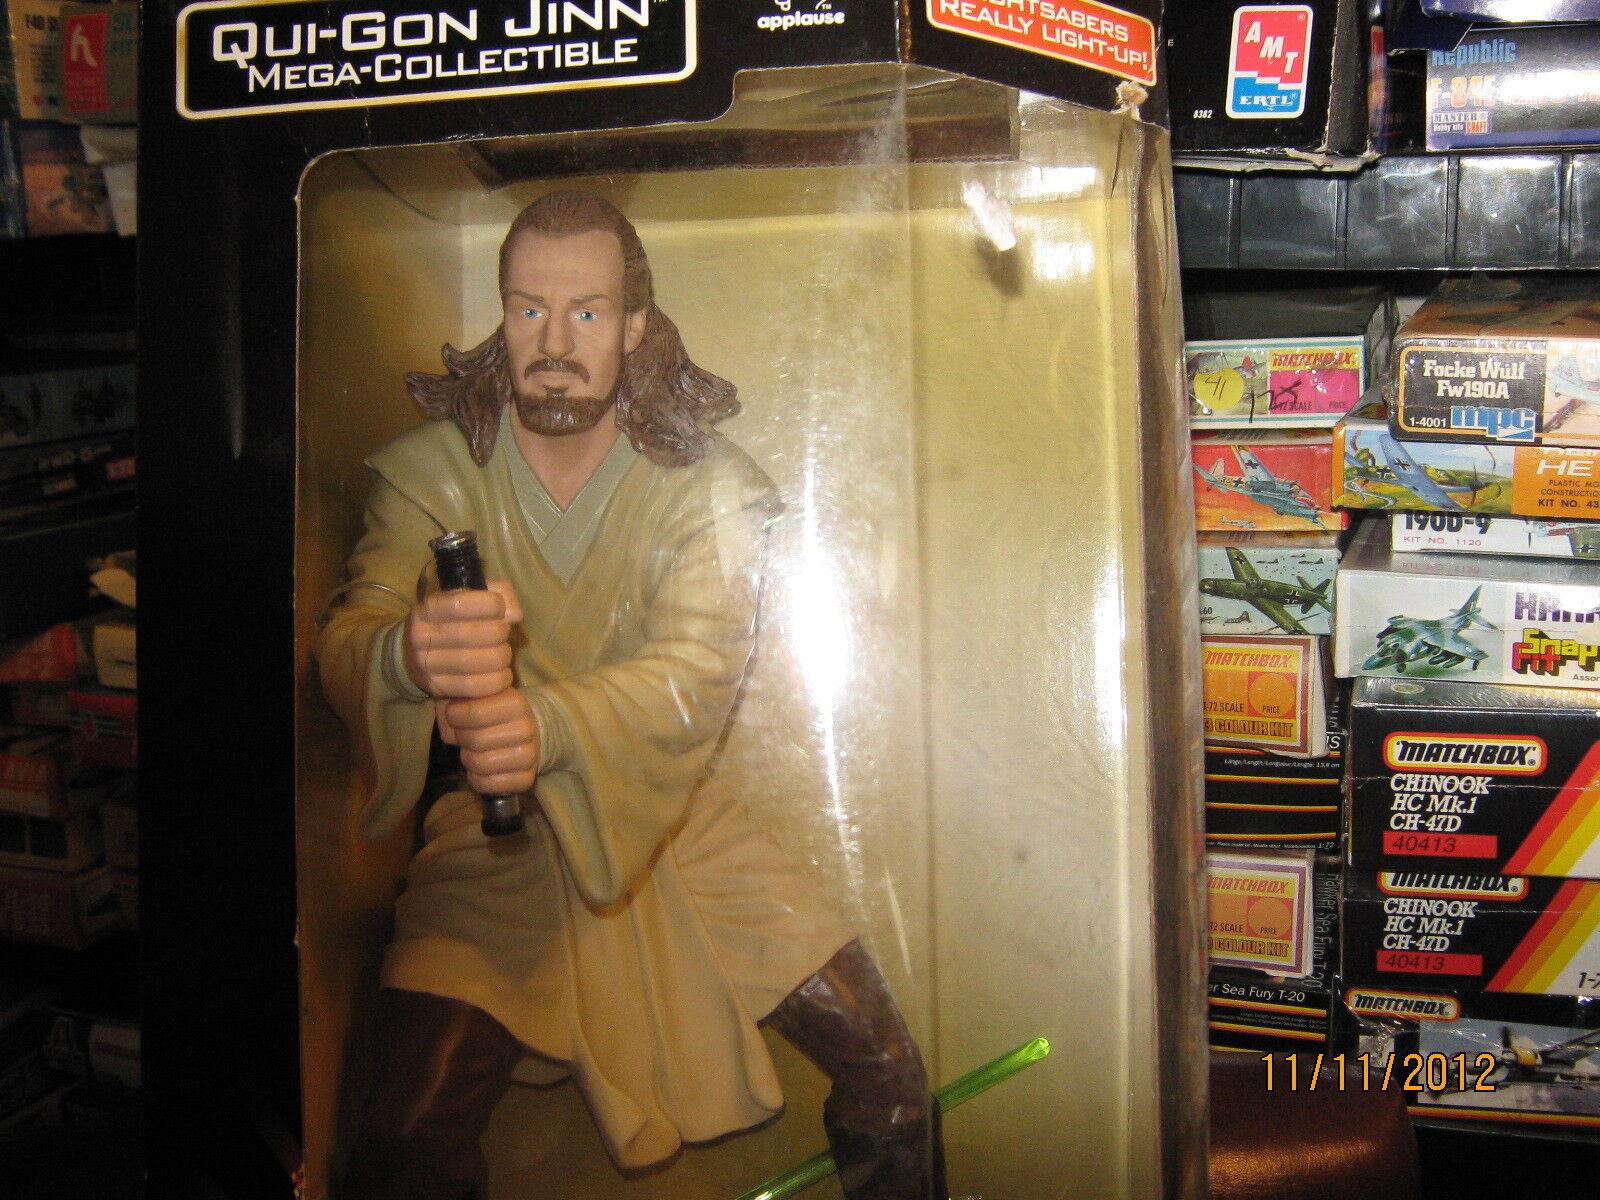 Star Star Star Wars Qui-Gon Jinn-Mega Collectible-12 Inch Figure-FREE SHIPPING 14c5e3